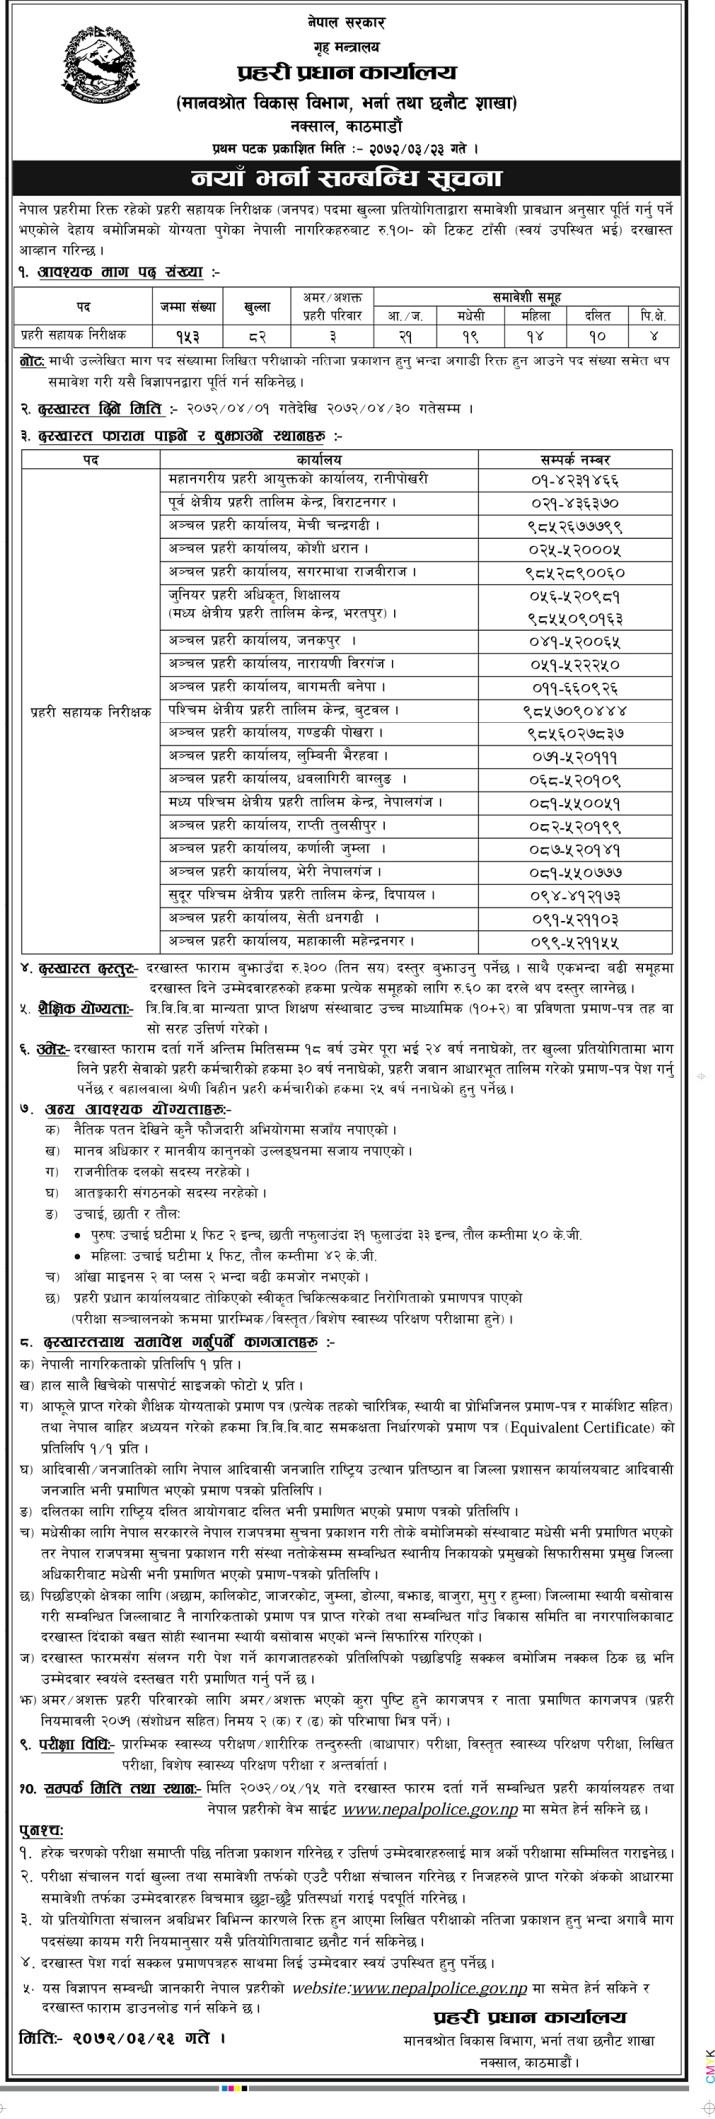 vacancy at Nepal Police.jpg